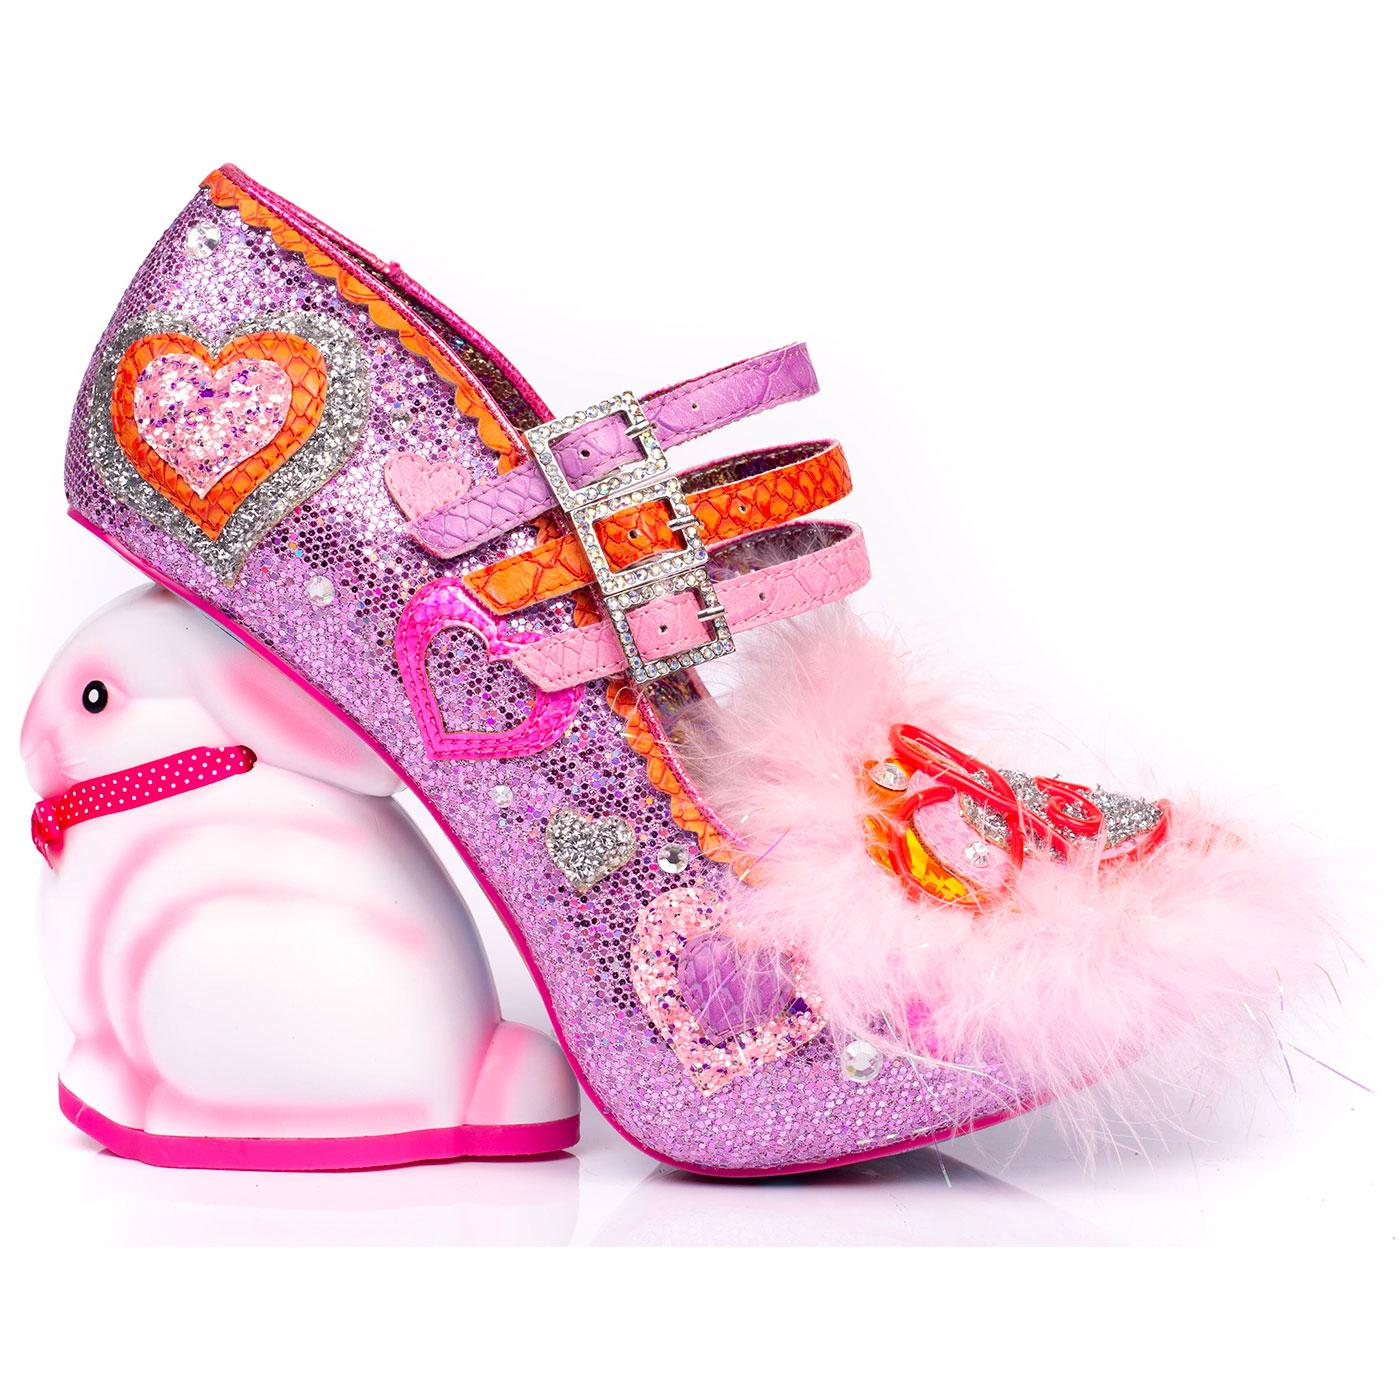 Hunnie Bunnie IRREGULAR CHOICE Character Heels